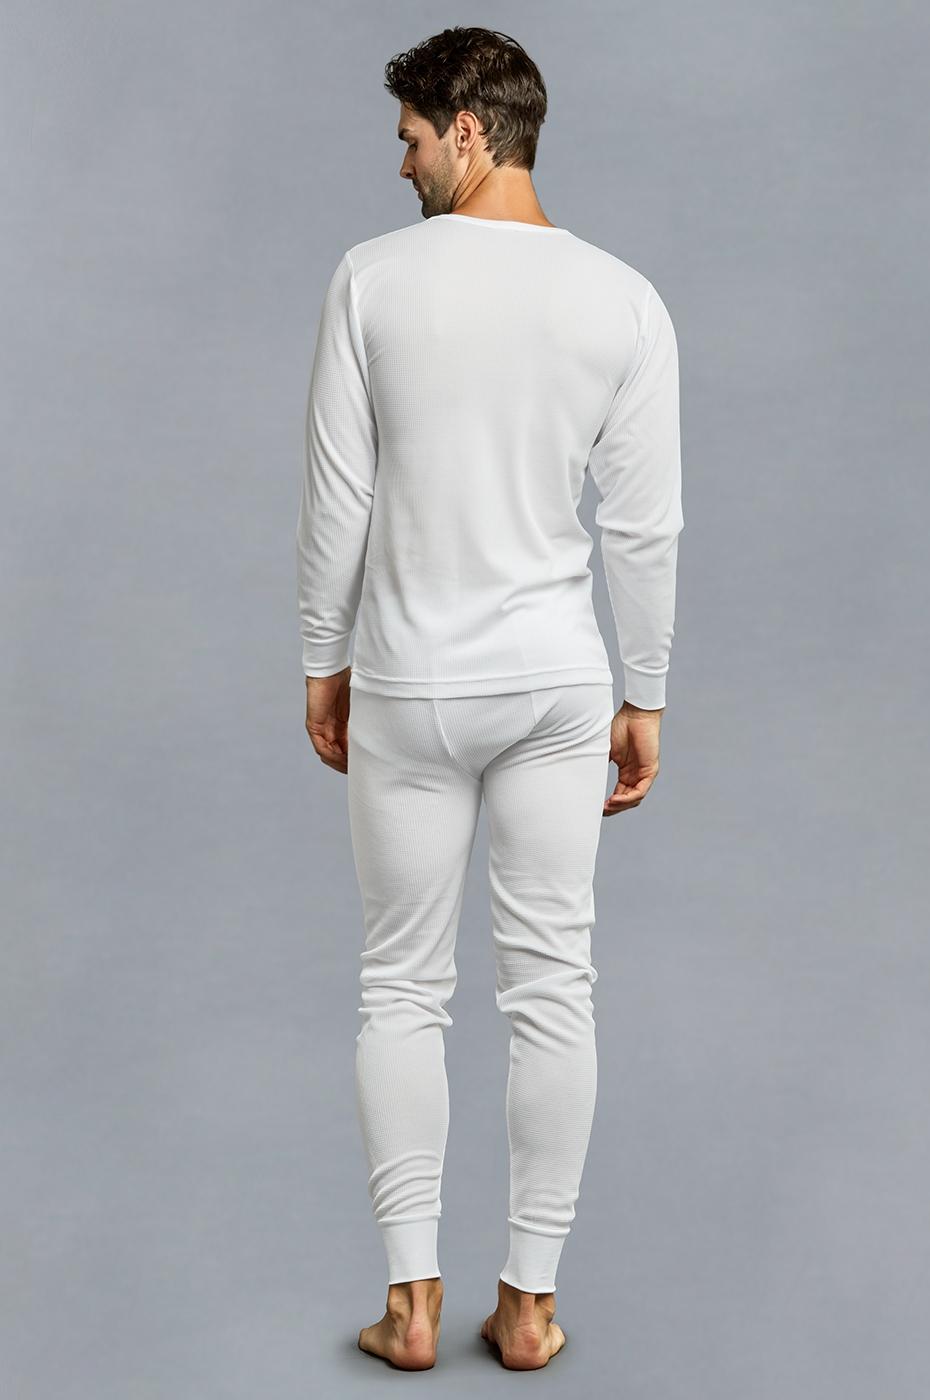 Men-039-s-Thermal-Long-Underwear-Top-Bottom-Medium-Weight-Waffle-Knit-Warm-Layering miniatuur 9